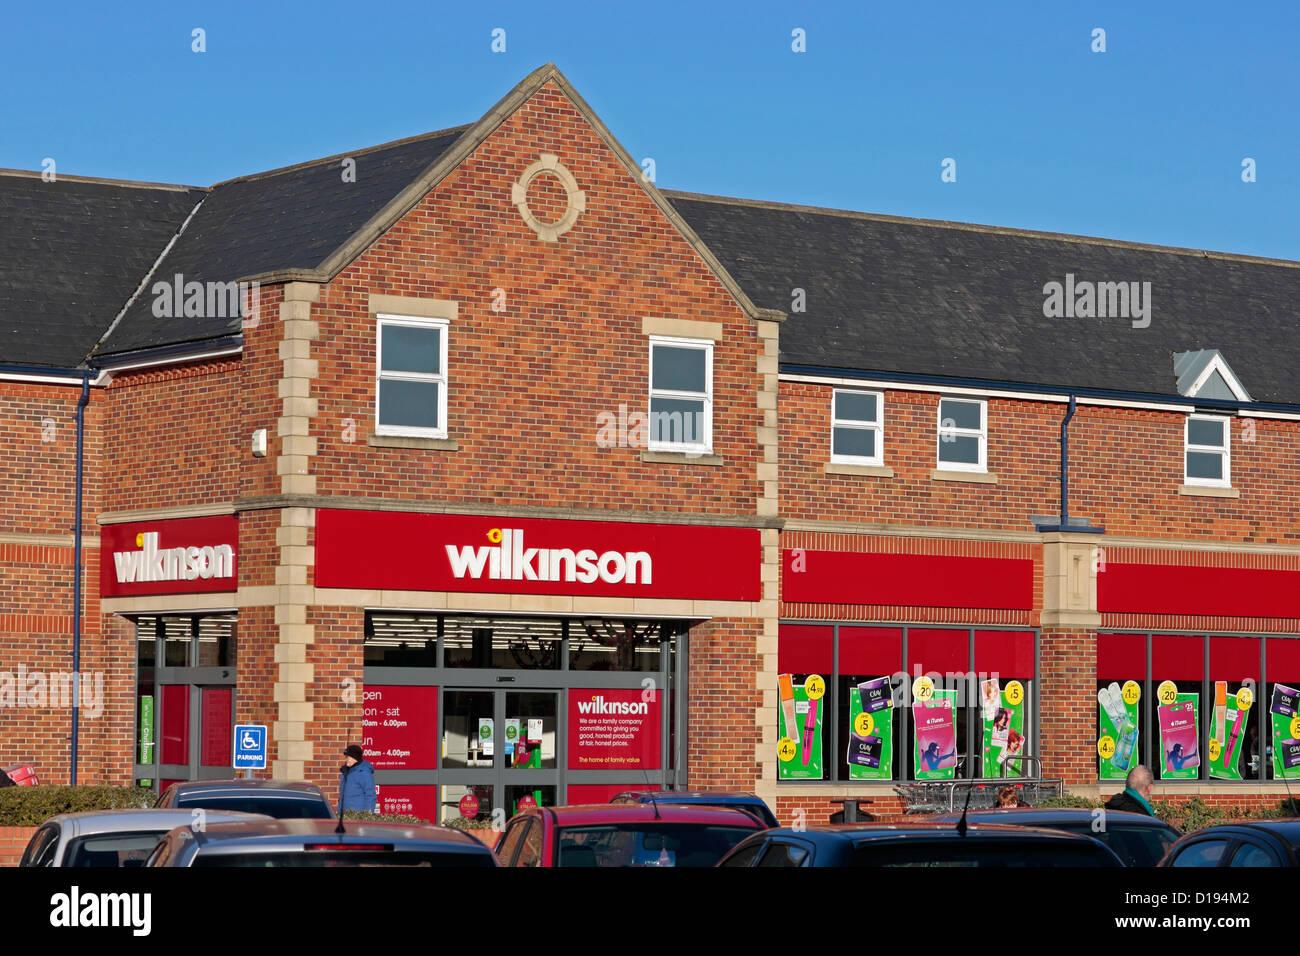 Wilkinson Store, Abbey Walk, Selby - Stock Image